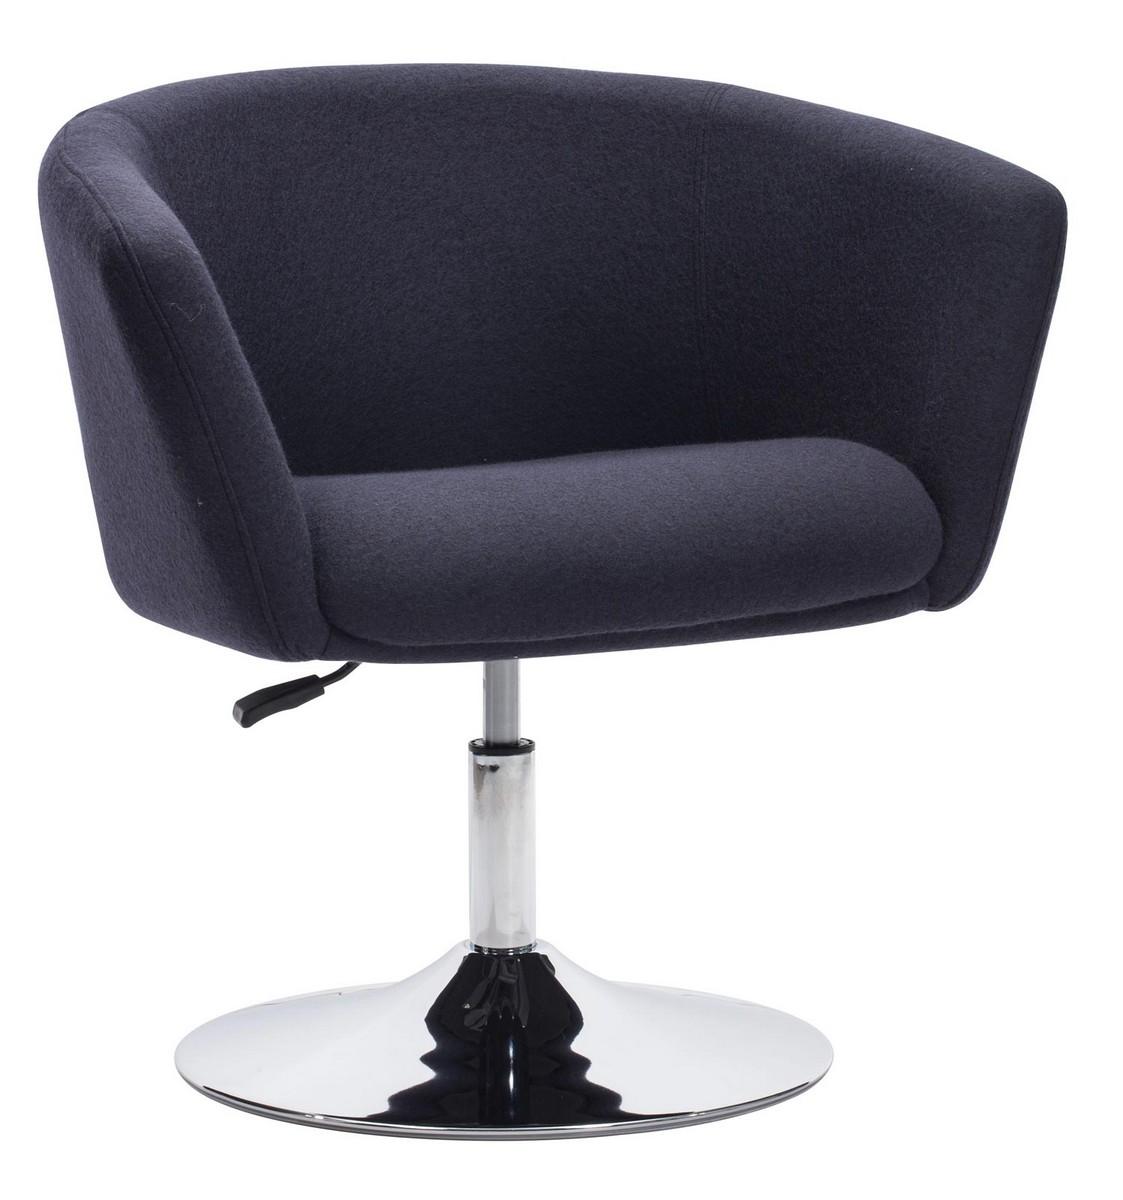 Zuo Modern Umea Occasional Chair - Iron Gray